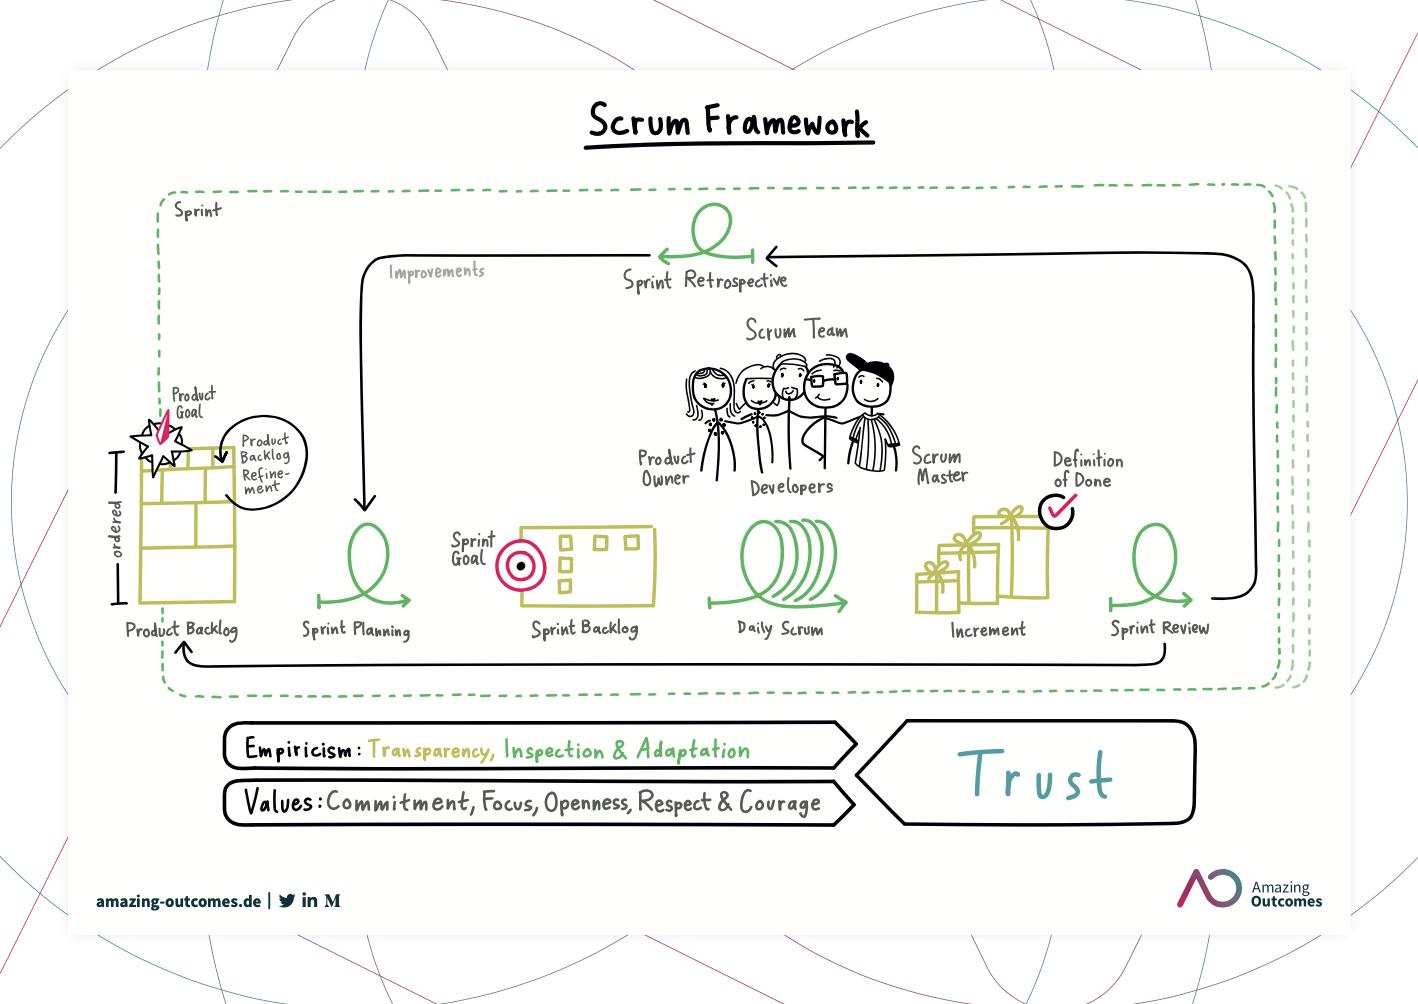 Scrum Framework 2020 Poster